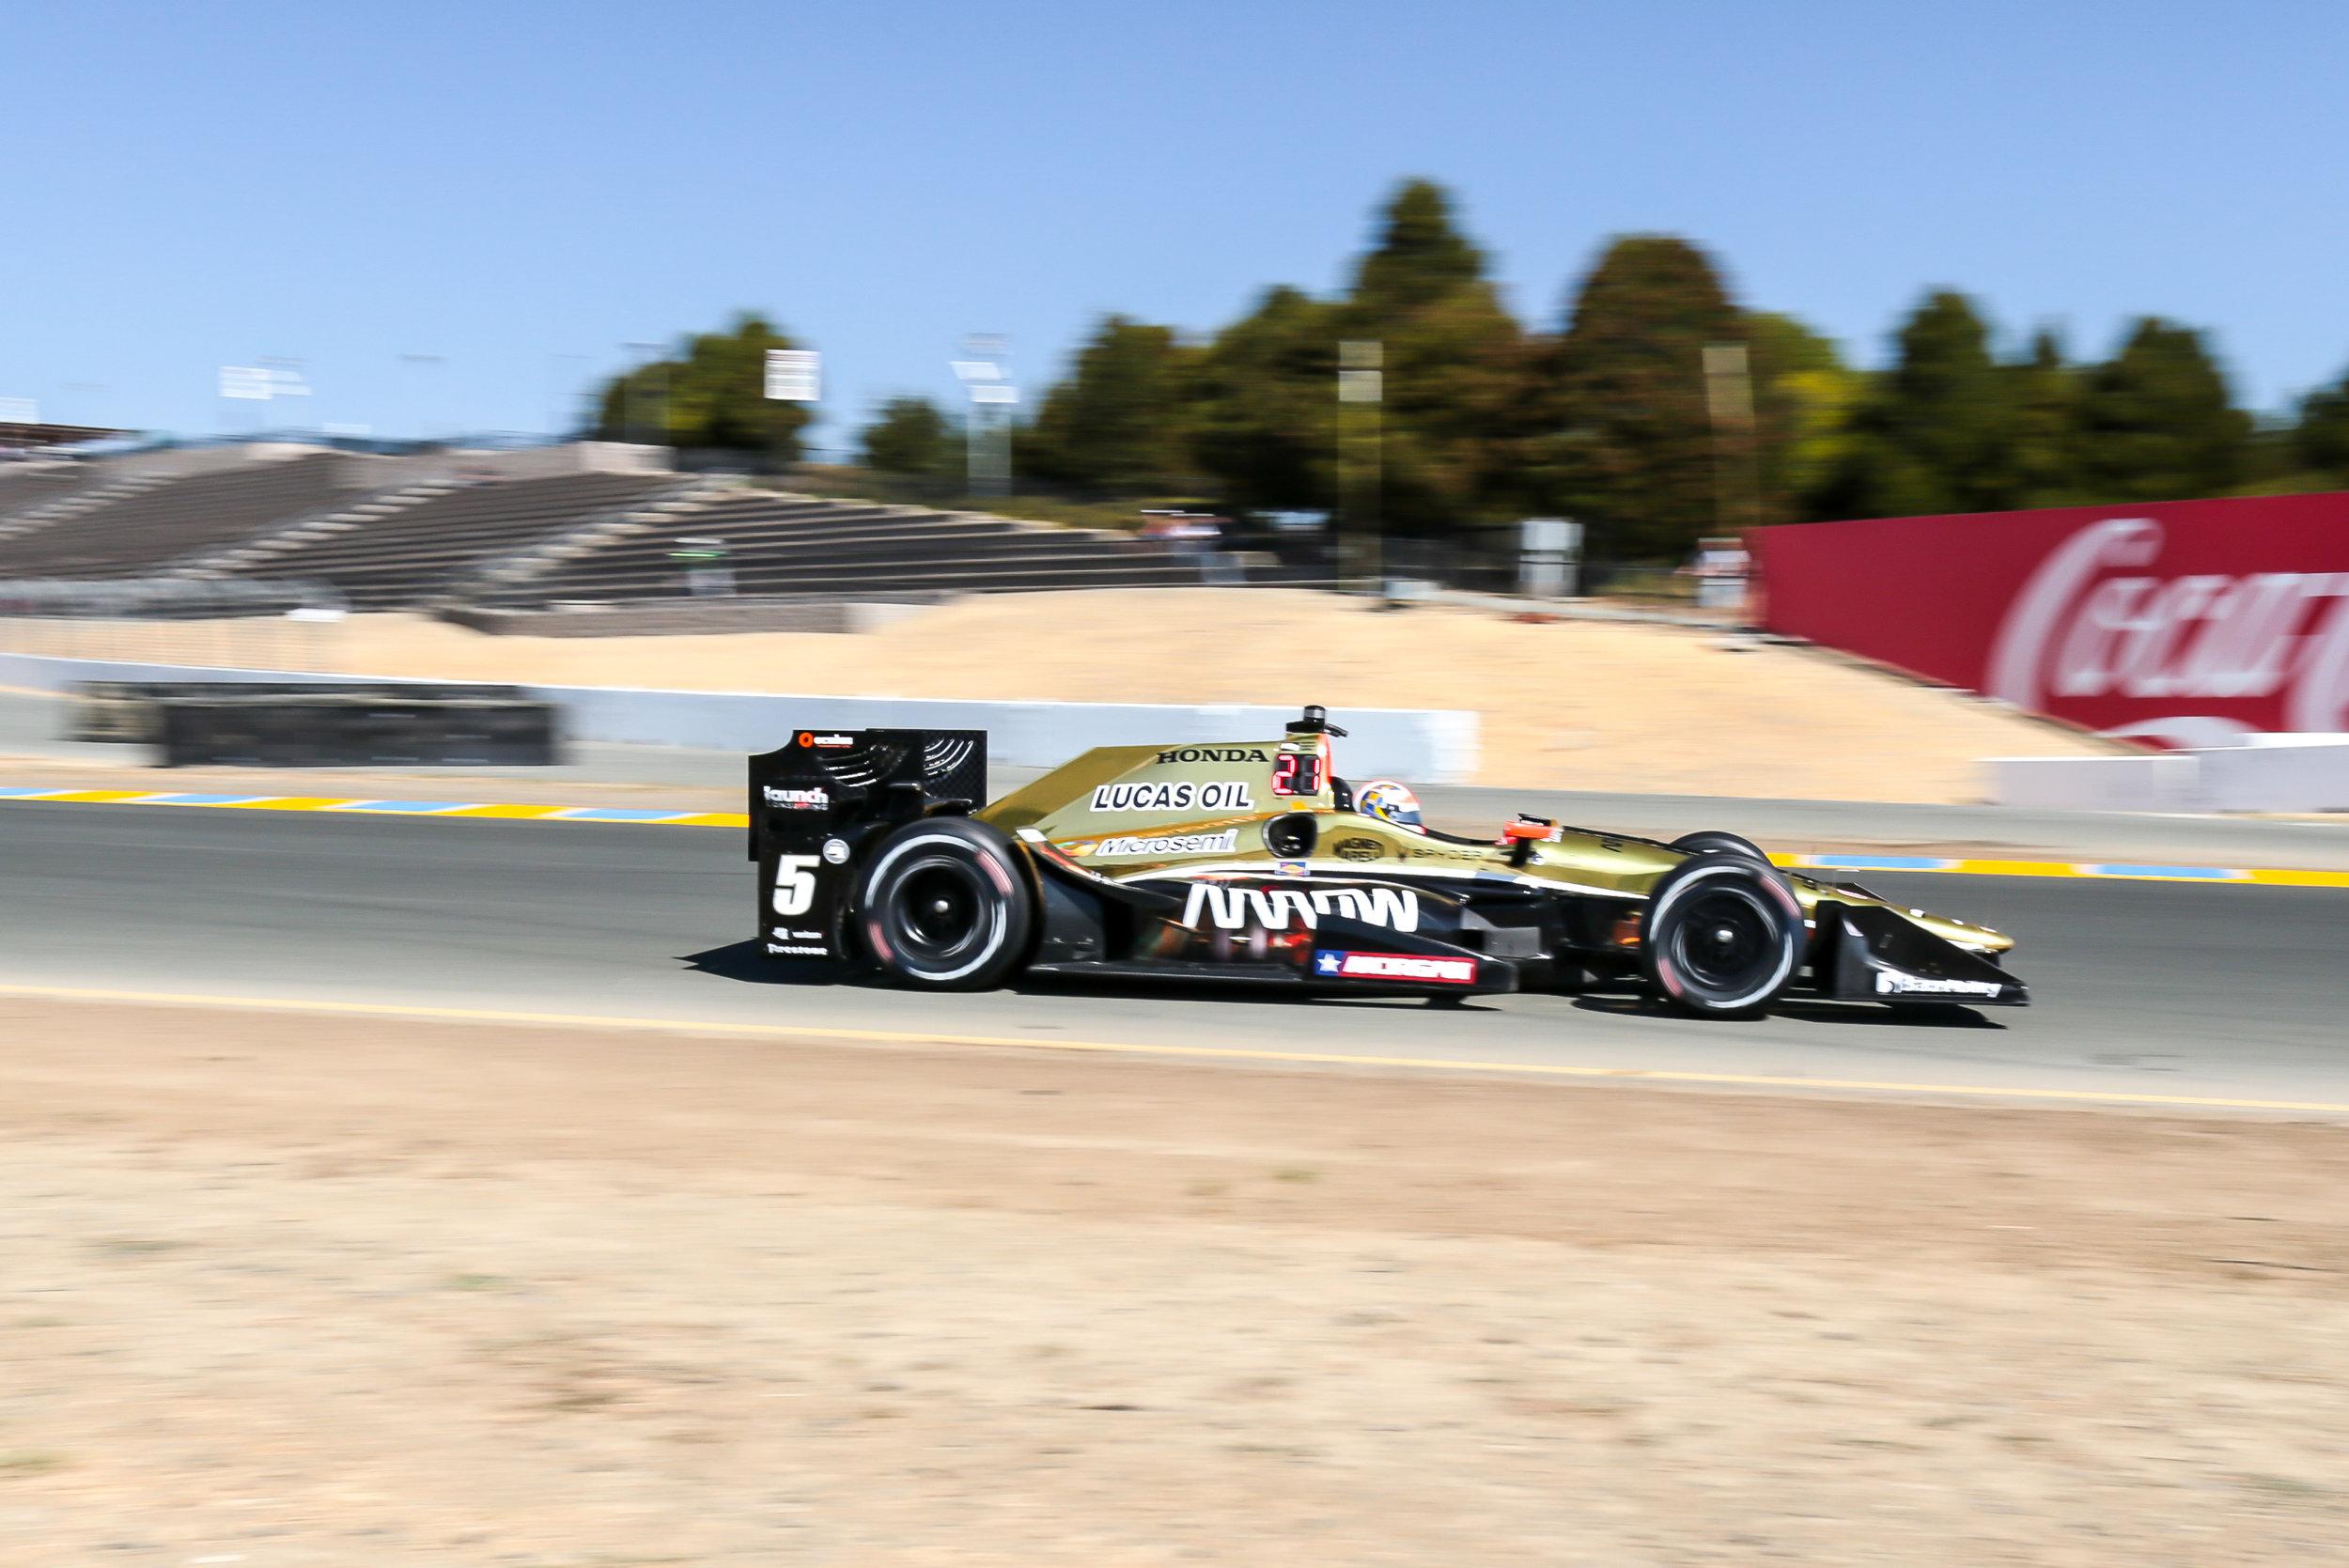 Indy16-2755.jpg